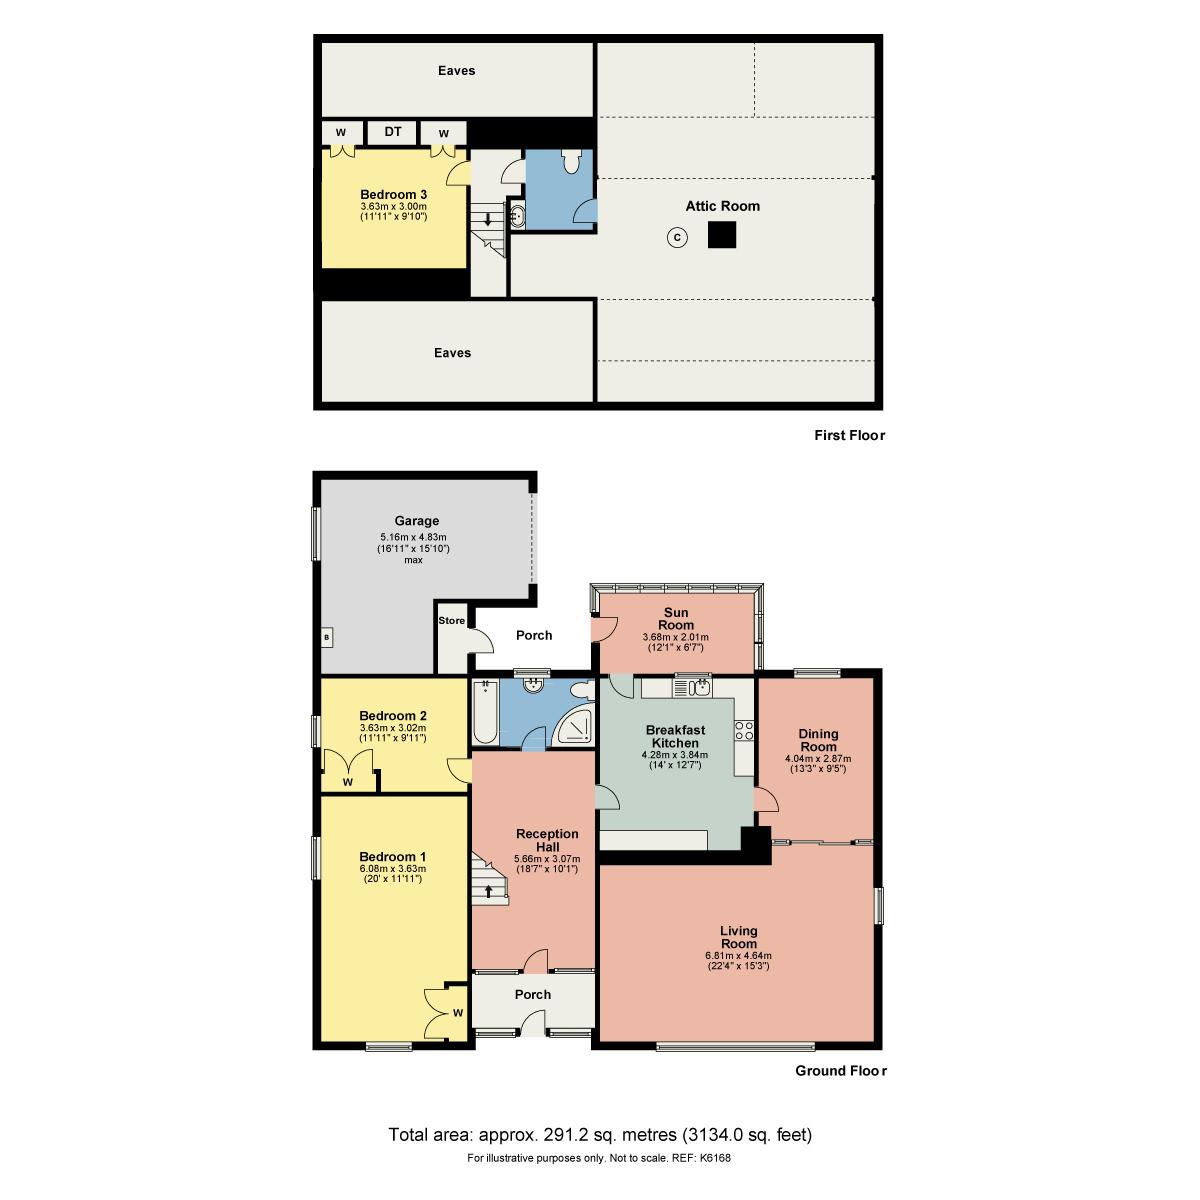 Floorplan 1 Robby Lea Drive, Natland, Kendal, Cumbria, LA9 7QP